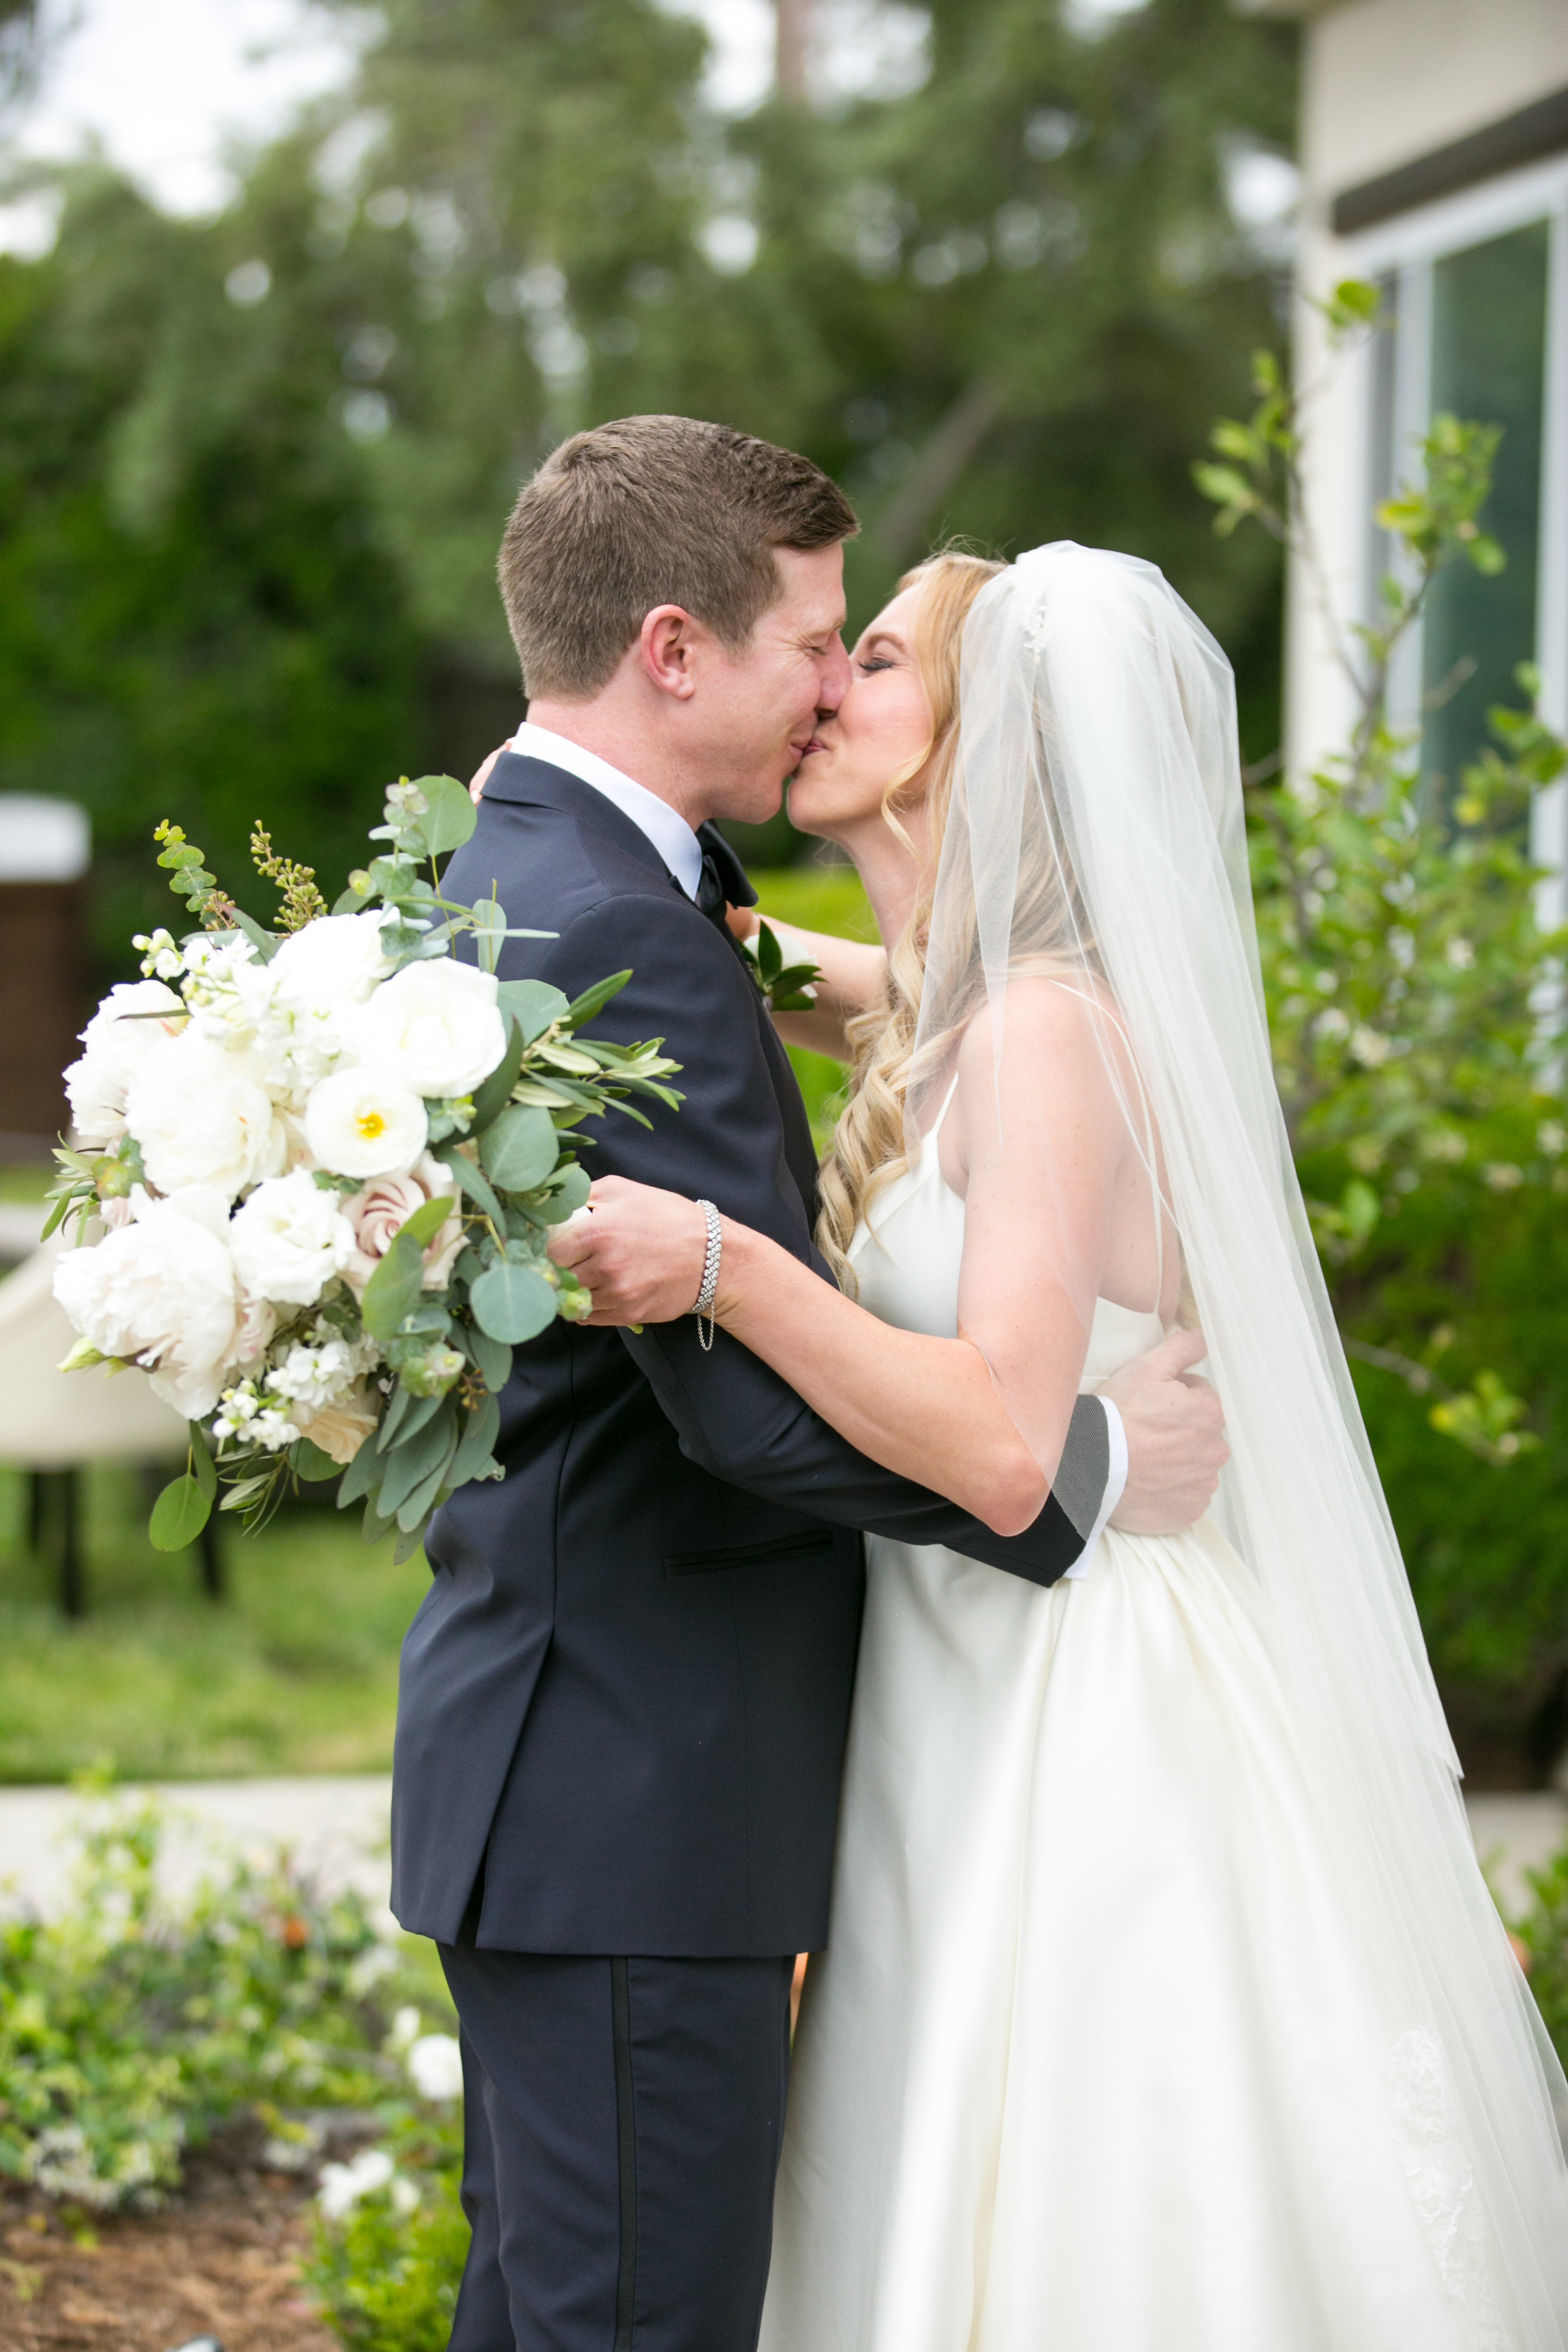 Jaosn Snorlax Photography Kyle & Jacqueline Wedding-57.jpg